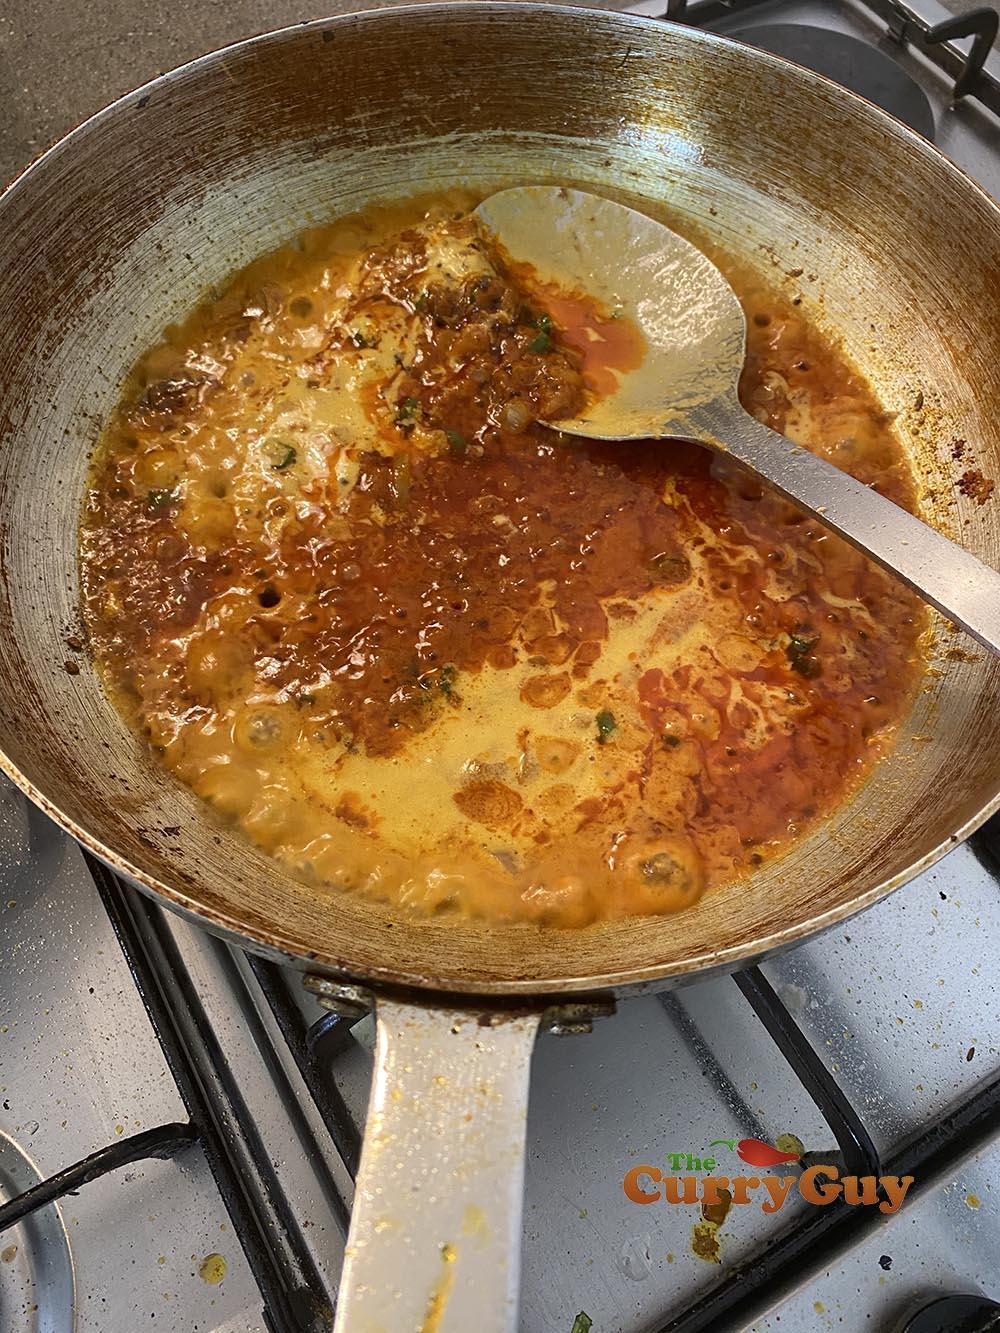 Adding base sauce